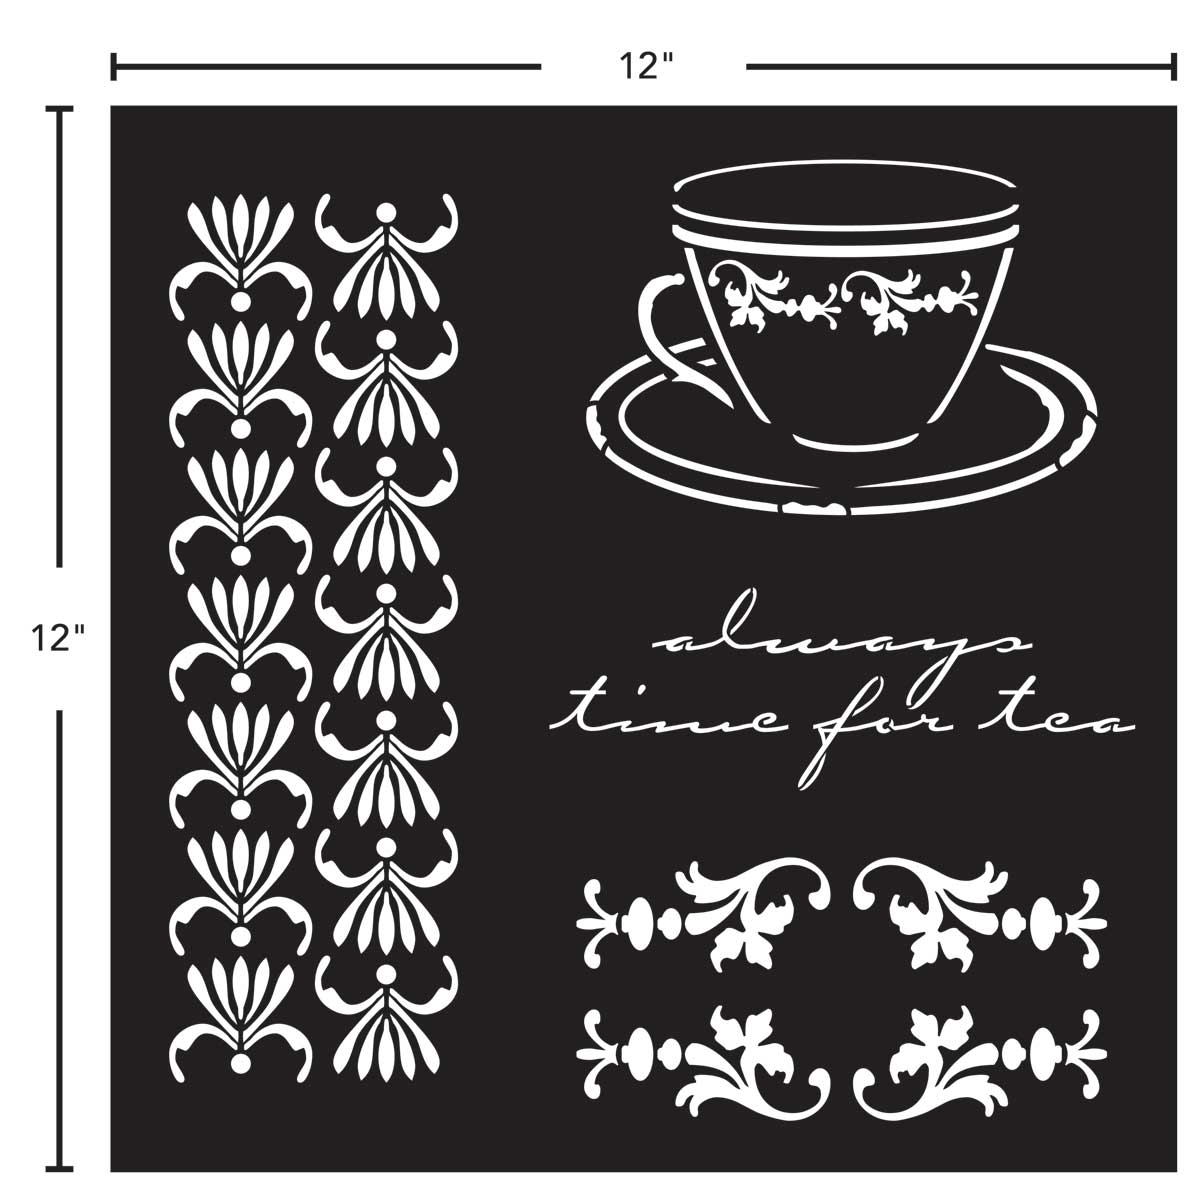 FolkArt ® Painting Stencils - Adhesive Laser - Tea Time - 63265